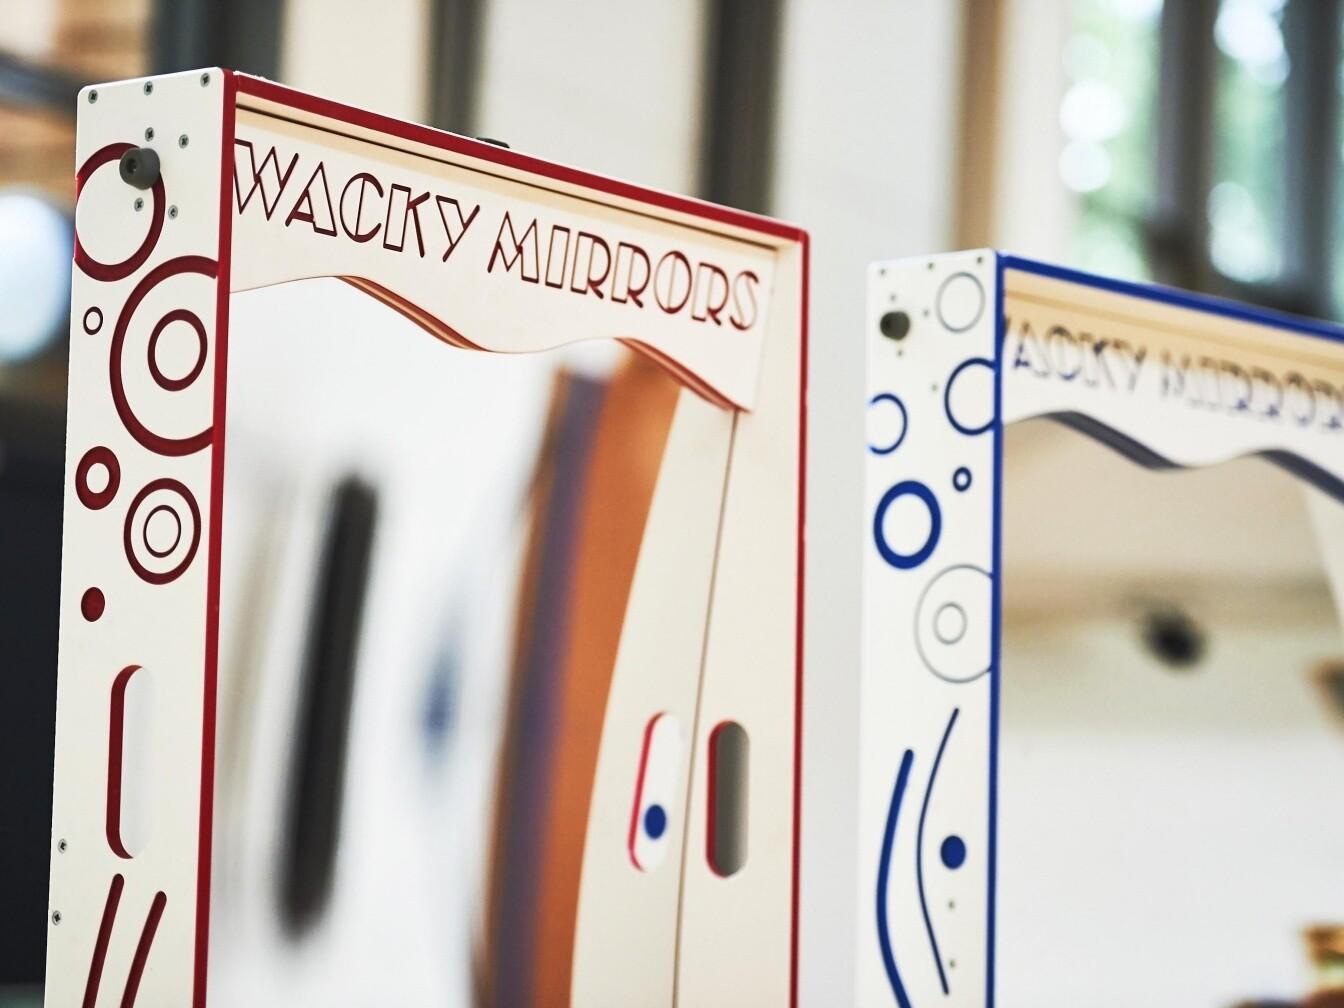 Wacky Mirrors Event Hire